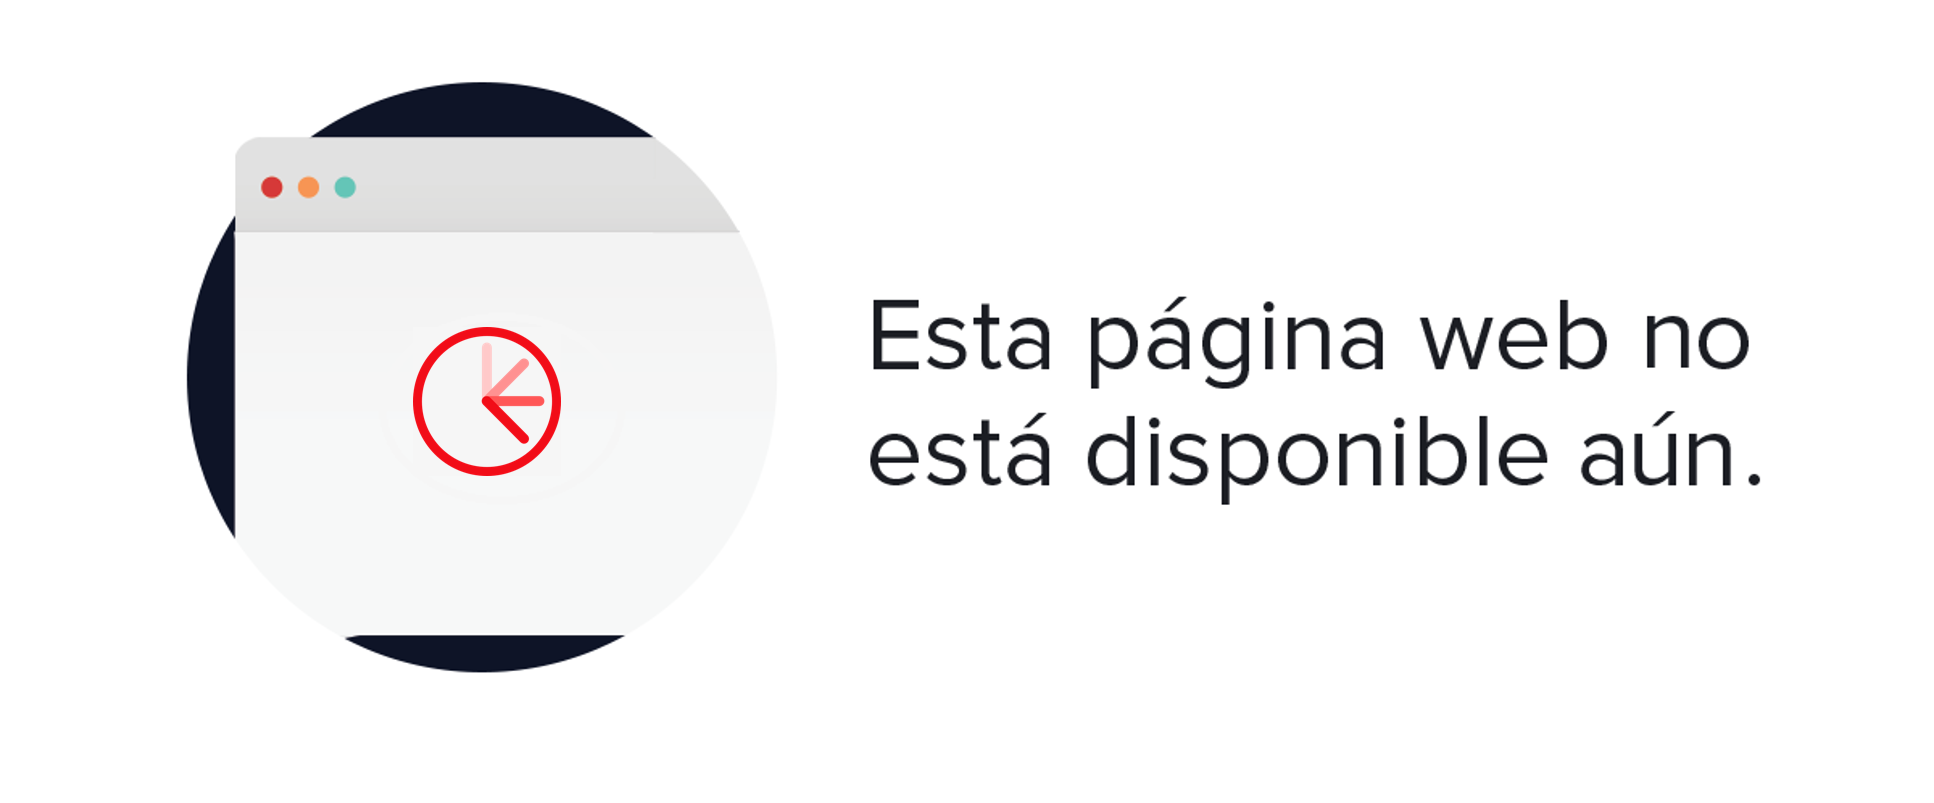 OXXO - Falda de Mujer OXXO corta y cruzada Blanco 8681613050204 - OAMHUQS